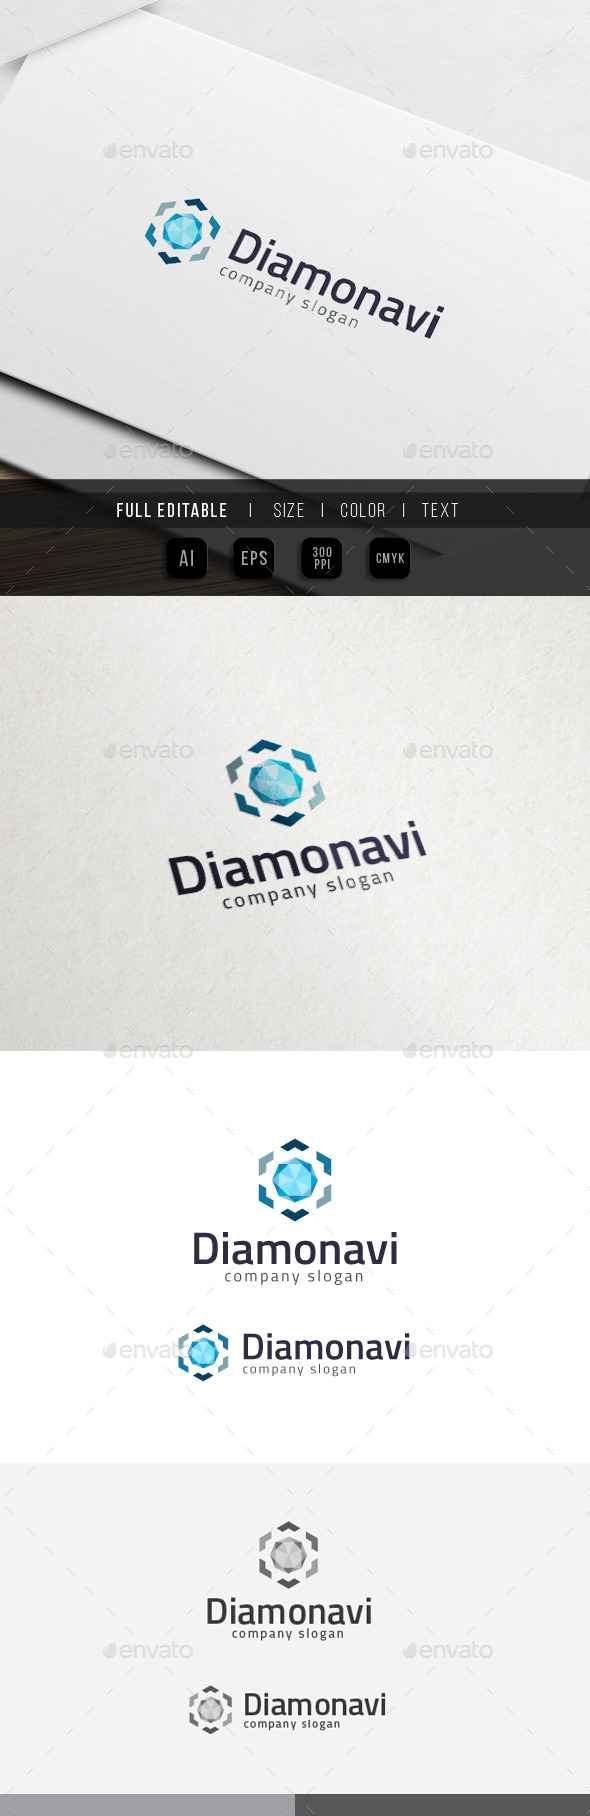 Diamond Navigation - Jewel Store Logo - Objects Logo Templates